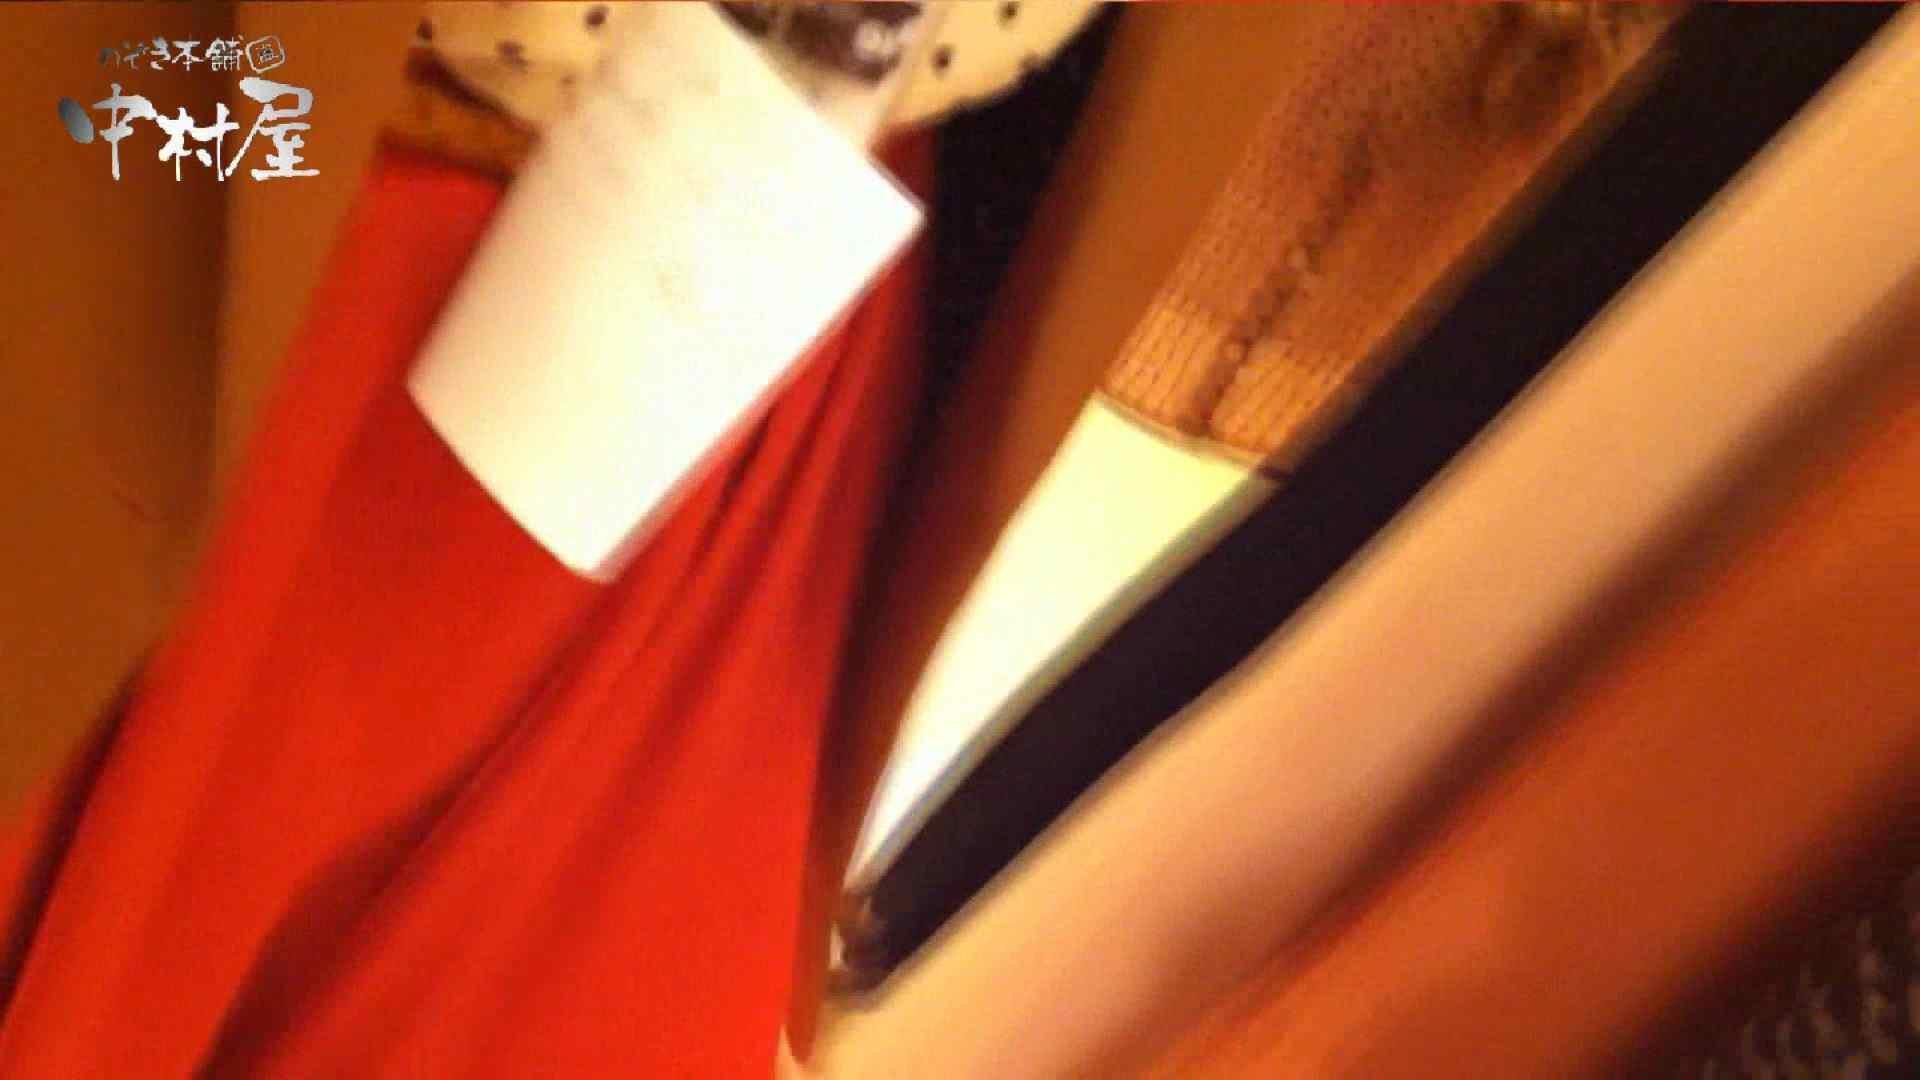 vol.45 可愛いカリスマ店員限定‼胸チラ&パンチラ 食い込みミッキーマウス! おまんこモロ出し   接写  107pic 86